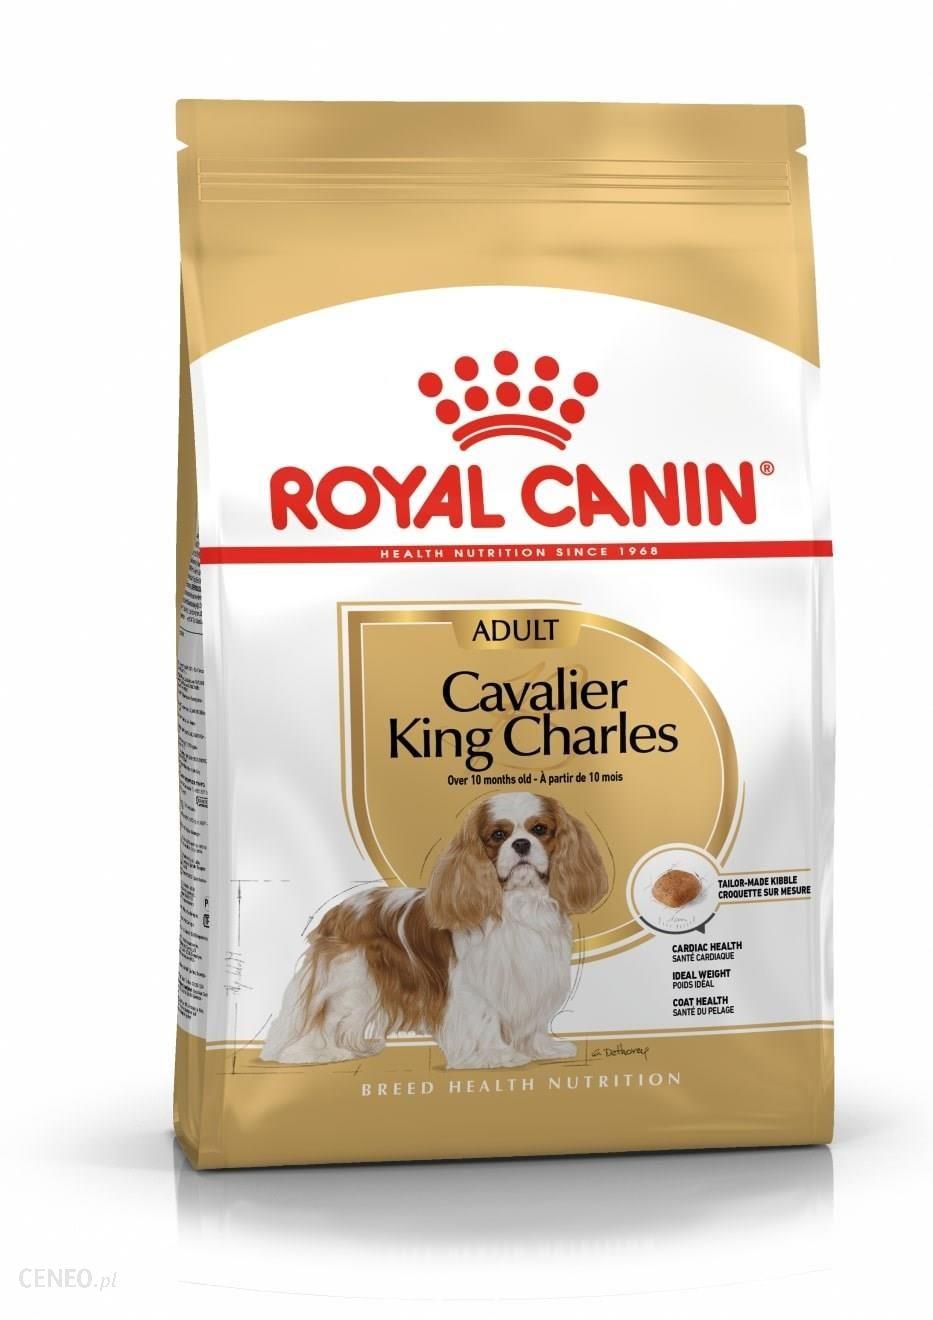 royal canin cavalier king charles